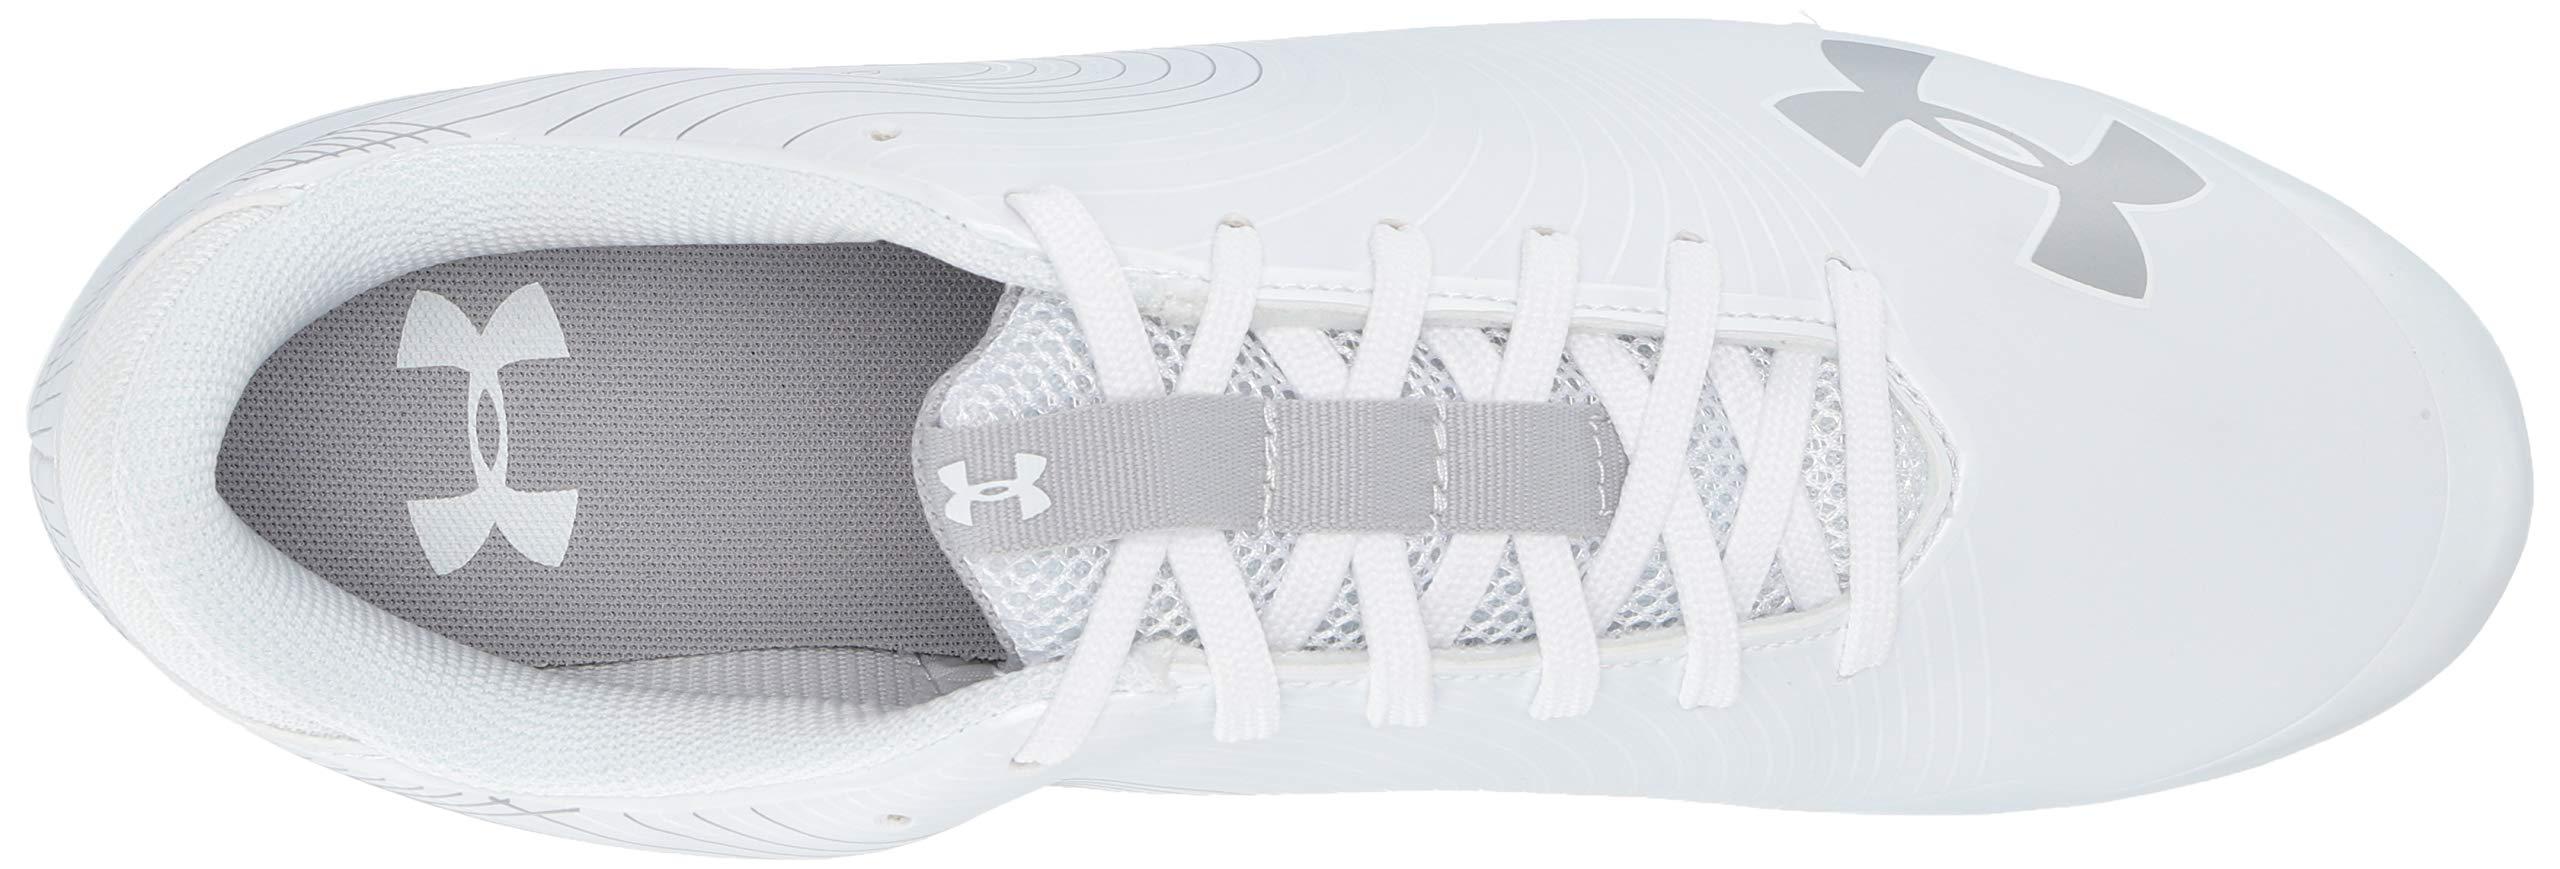 Under Armour Men's Speed Phantom MC Football Shoe, White/White, 7.5 M US by Under Armour (Image #7)